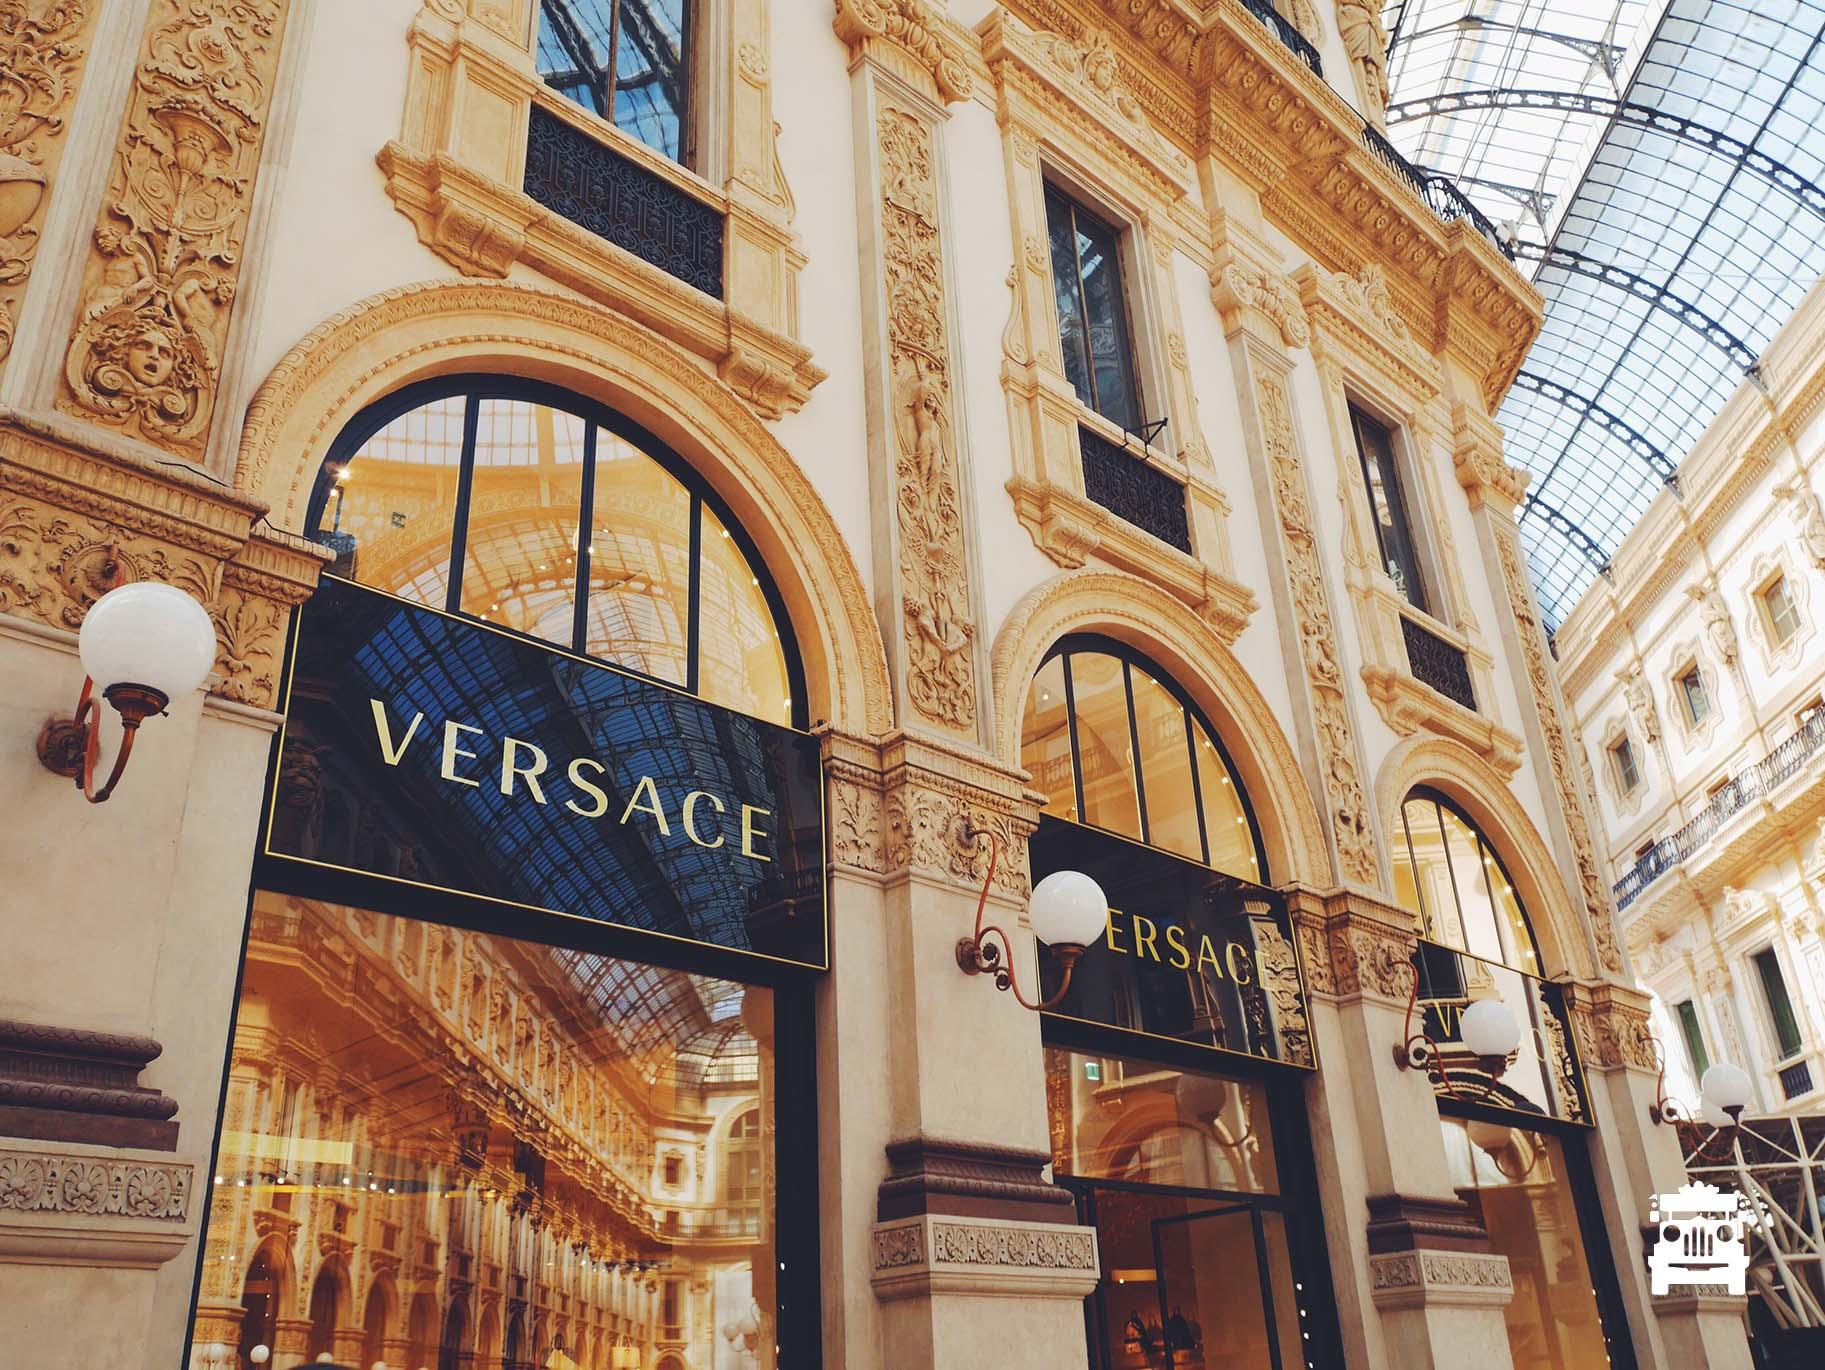 Where I shop for underwear ;)